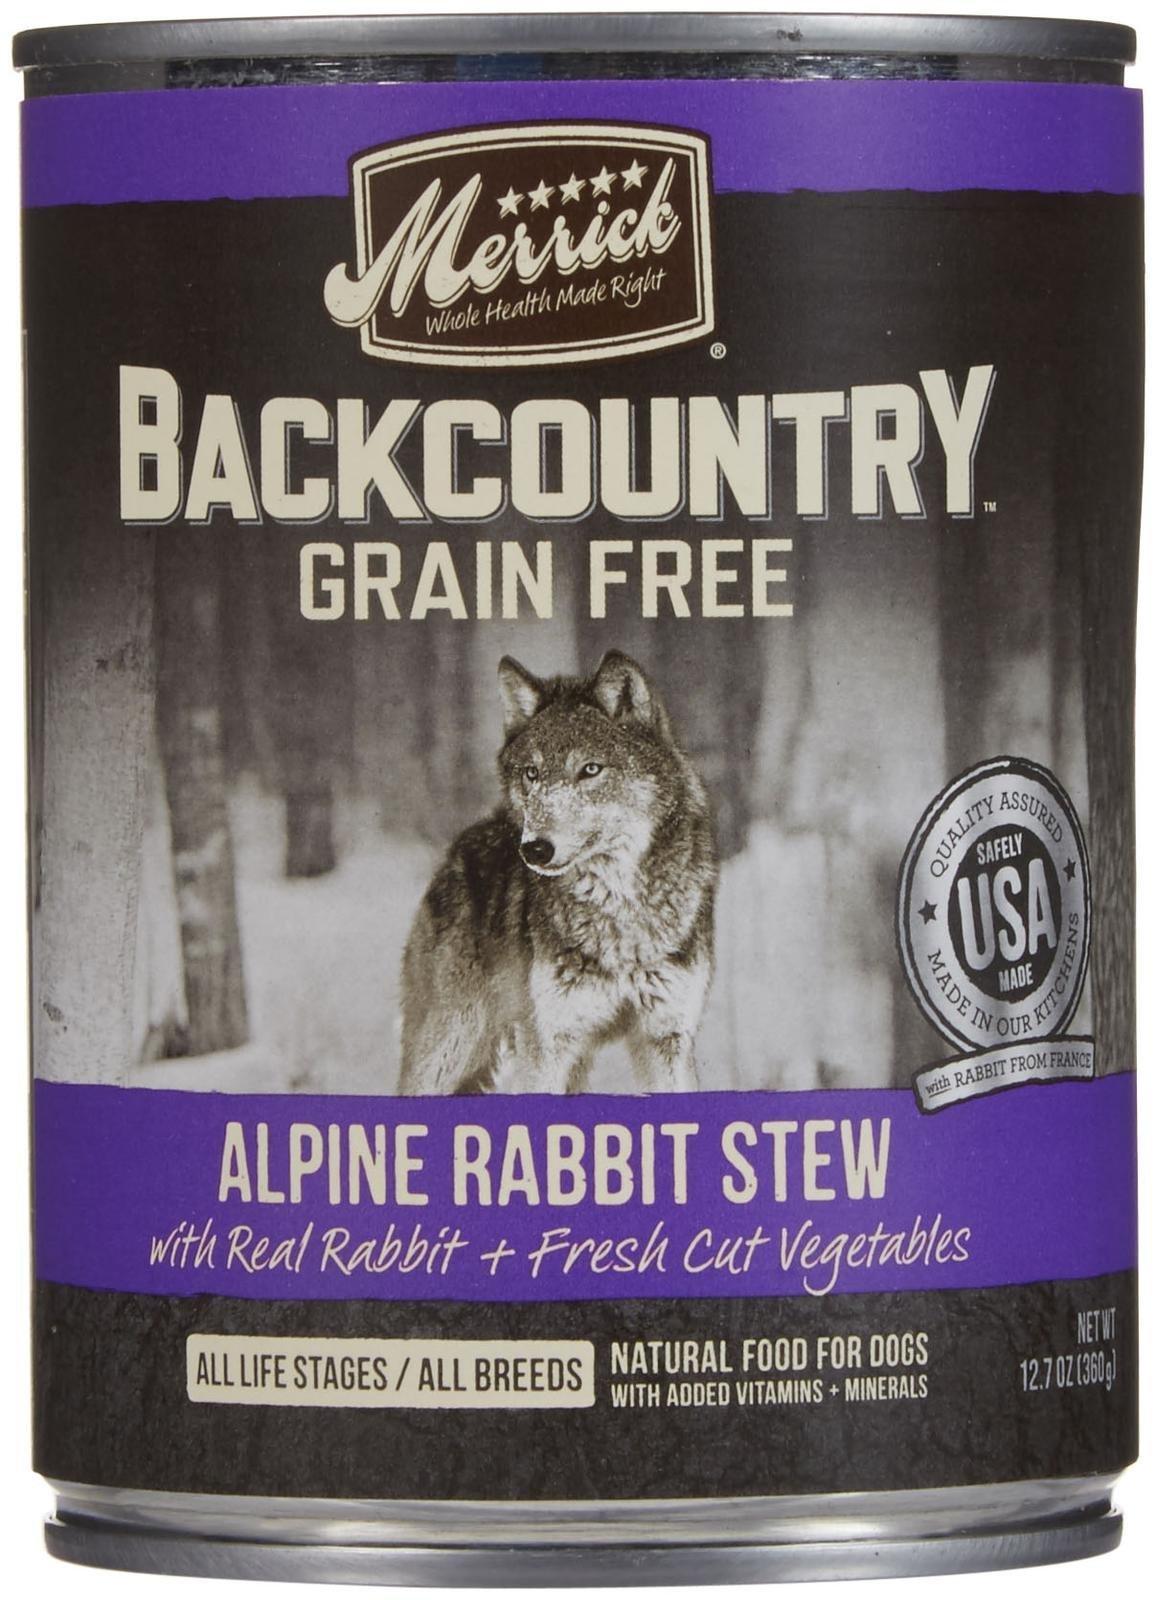 Merrick Backcountry - Alpine Rabbit Stew - 12.7 oz - 12 ct